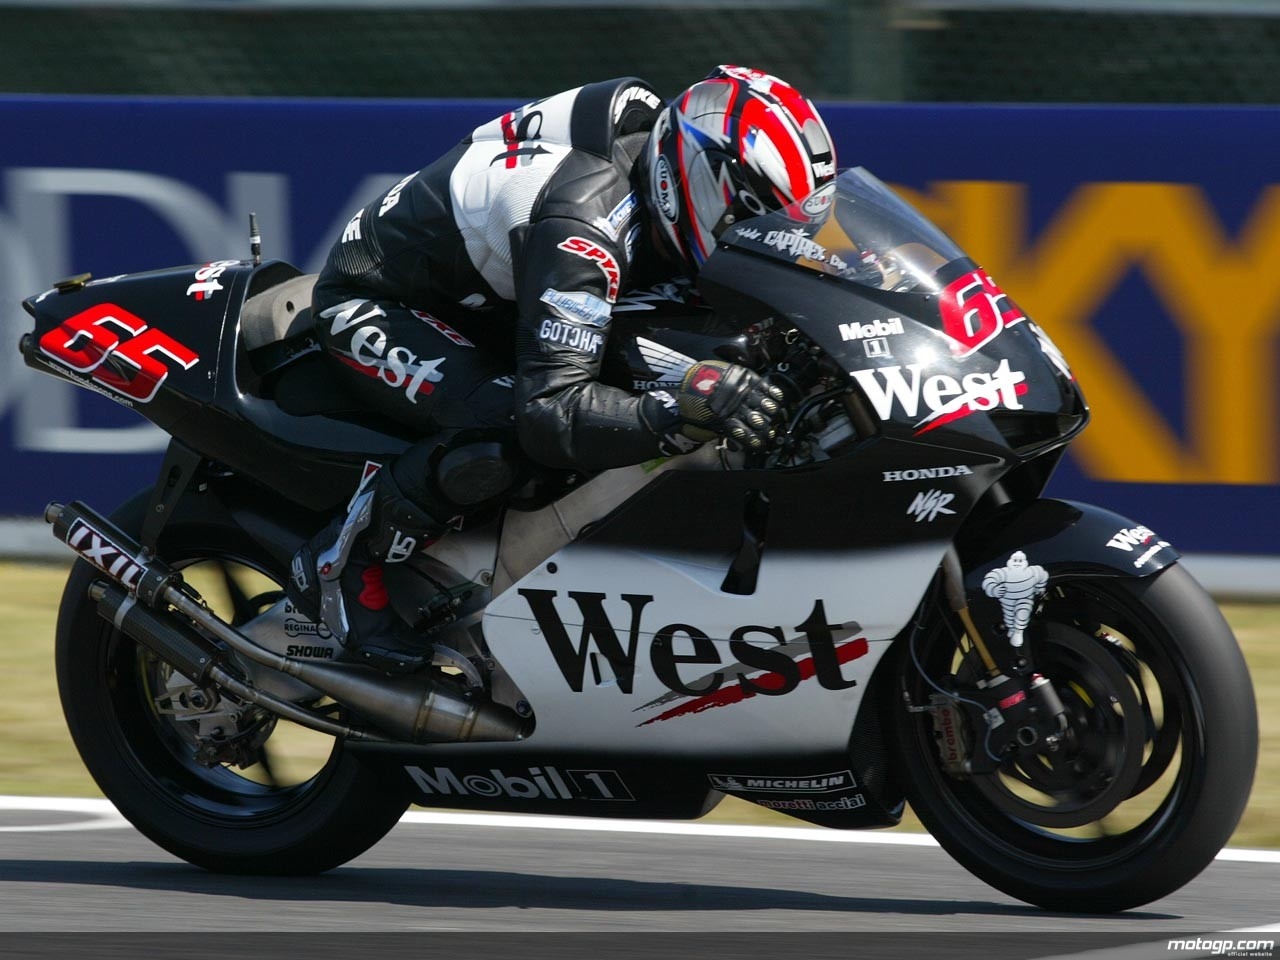 NSR500 TEAM Honda Pons WEST -02 HD | RaceDepartment